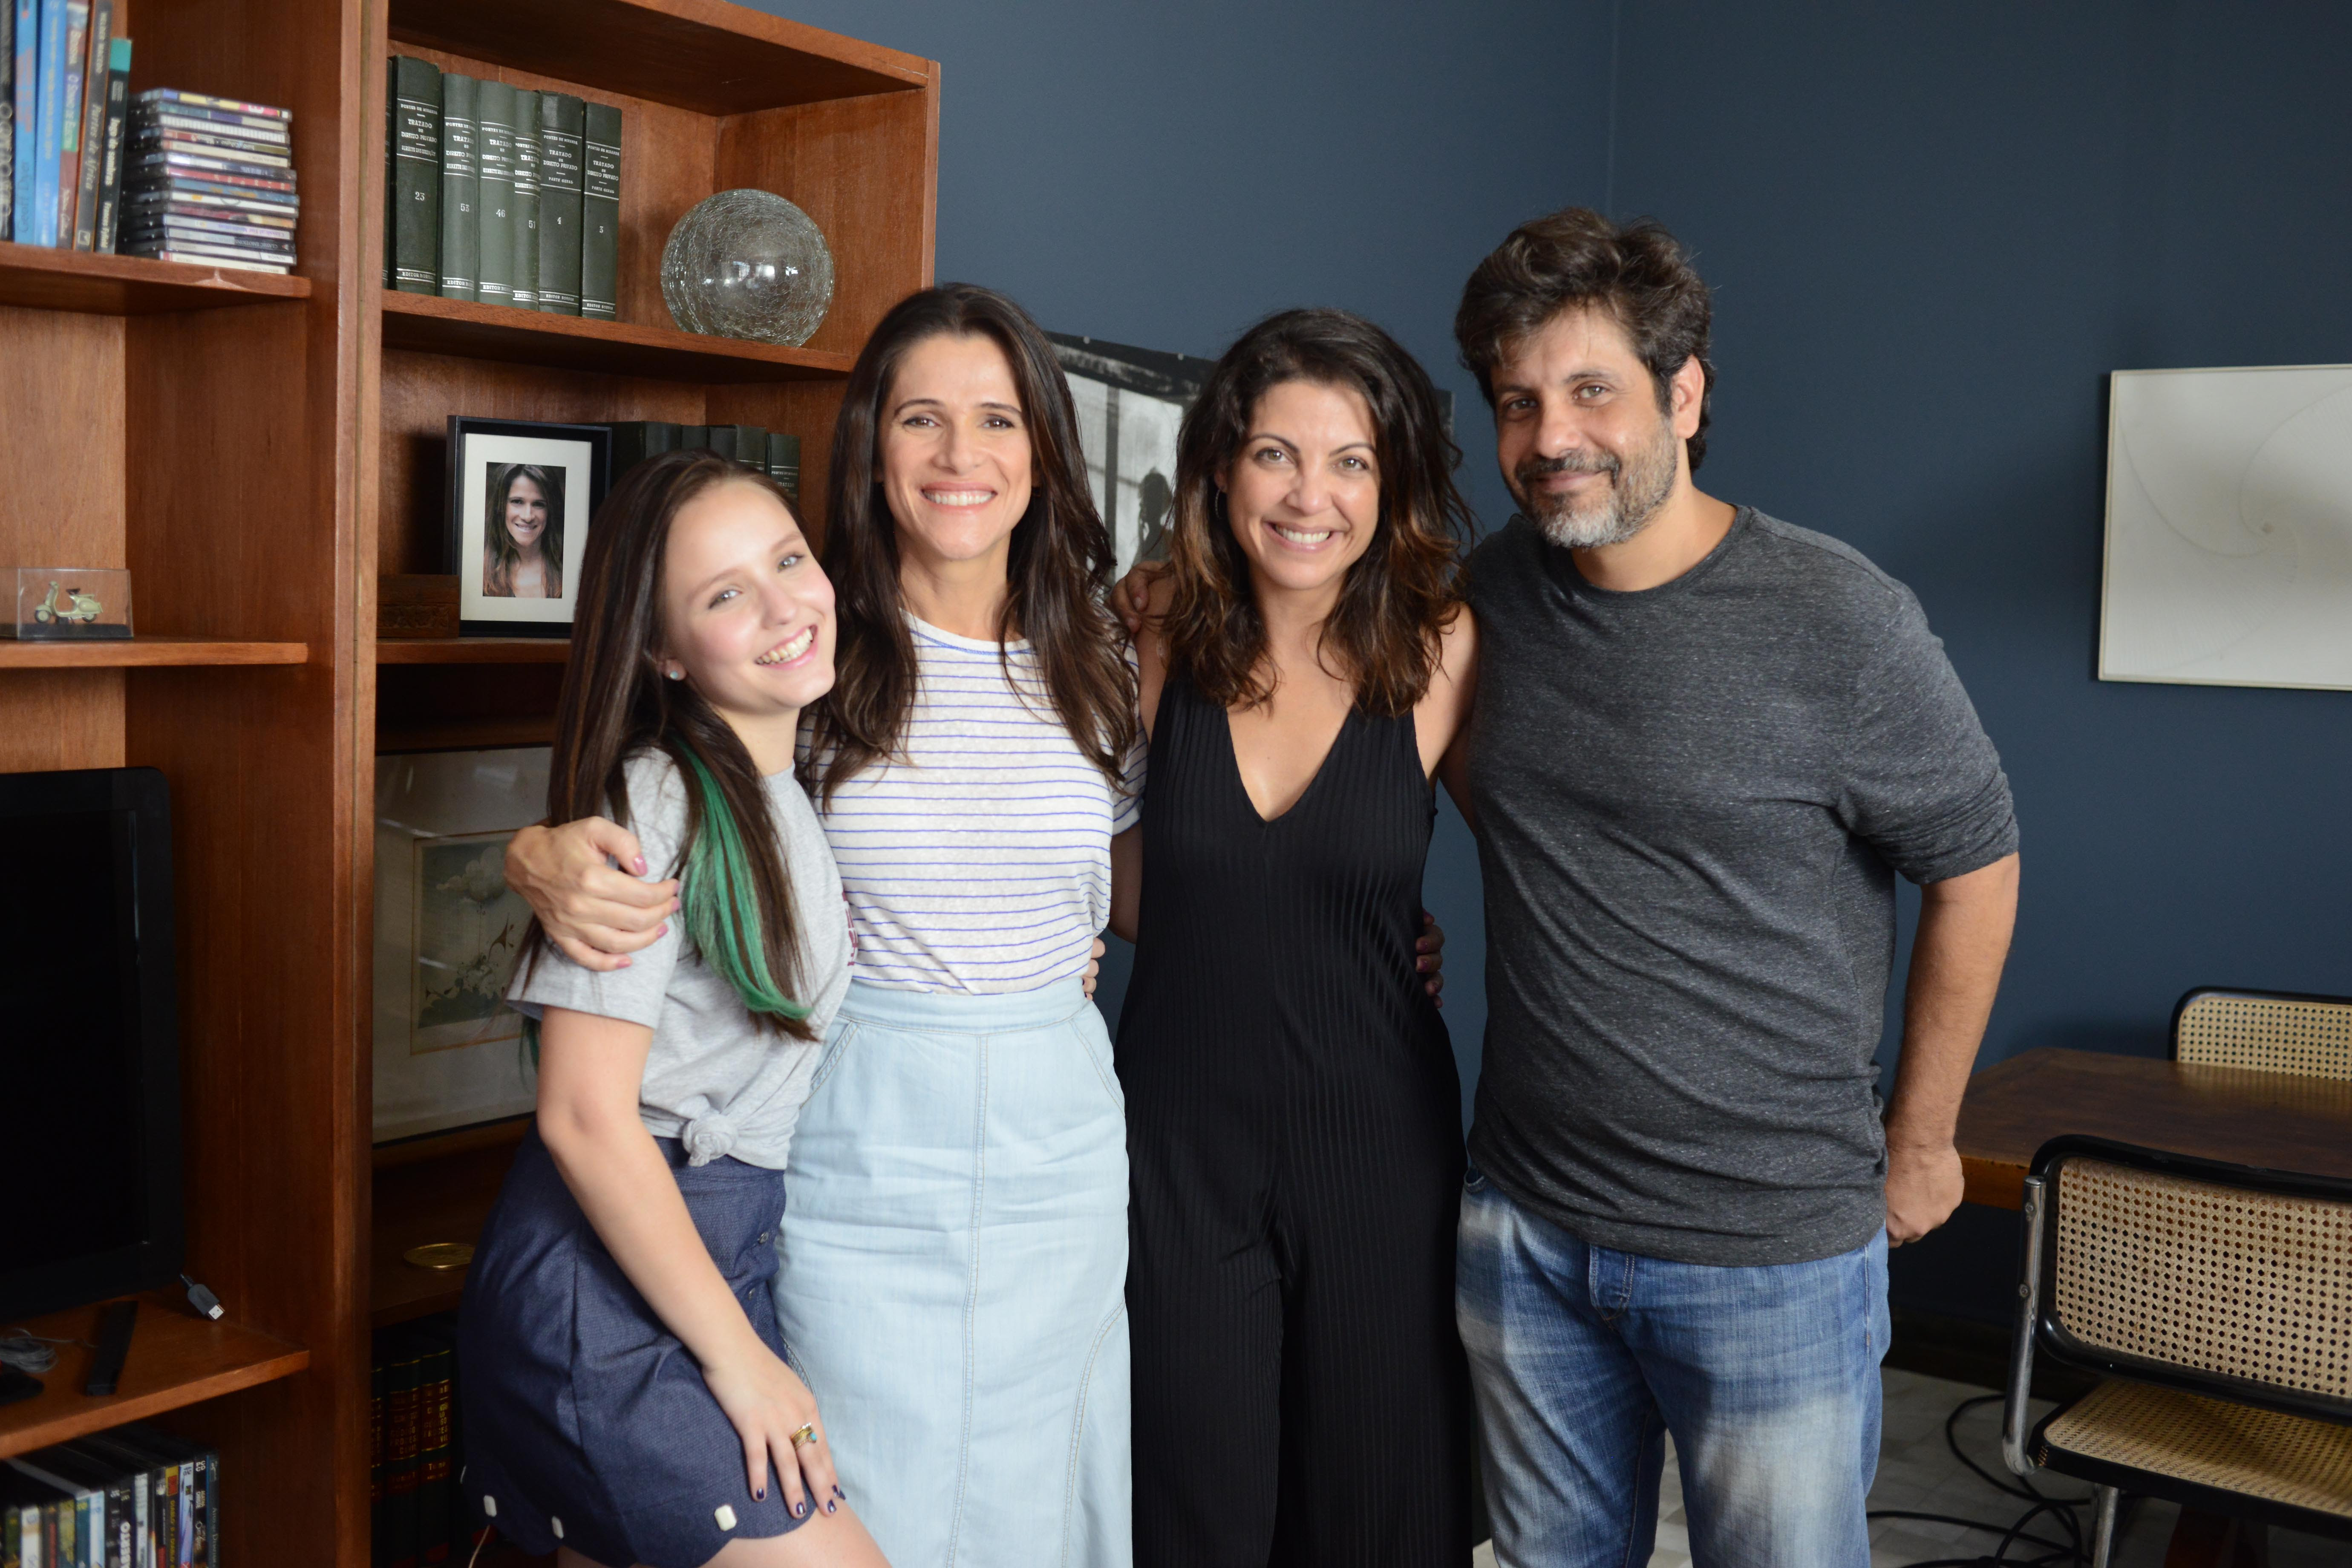 Larissa Manoela, Ingrid Guimarães, Thalita Rebouças e Pedro Vasconcelos (Foto: Divulgação)